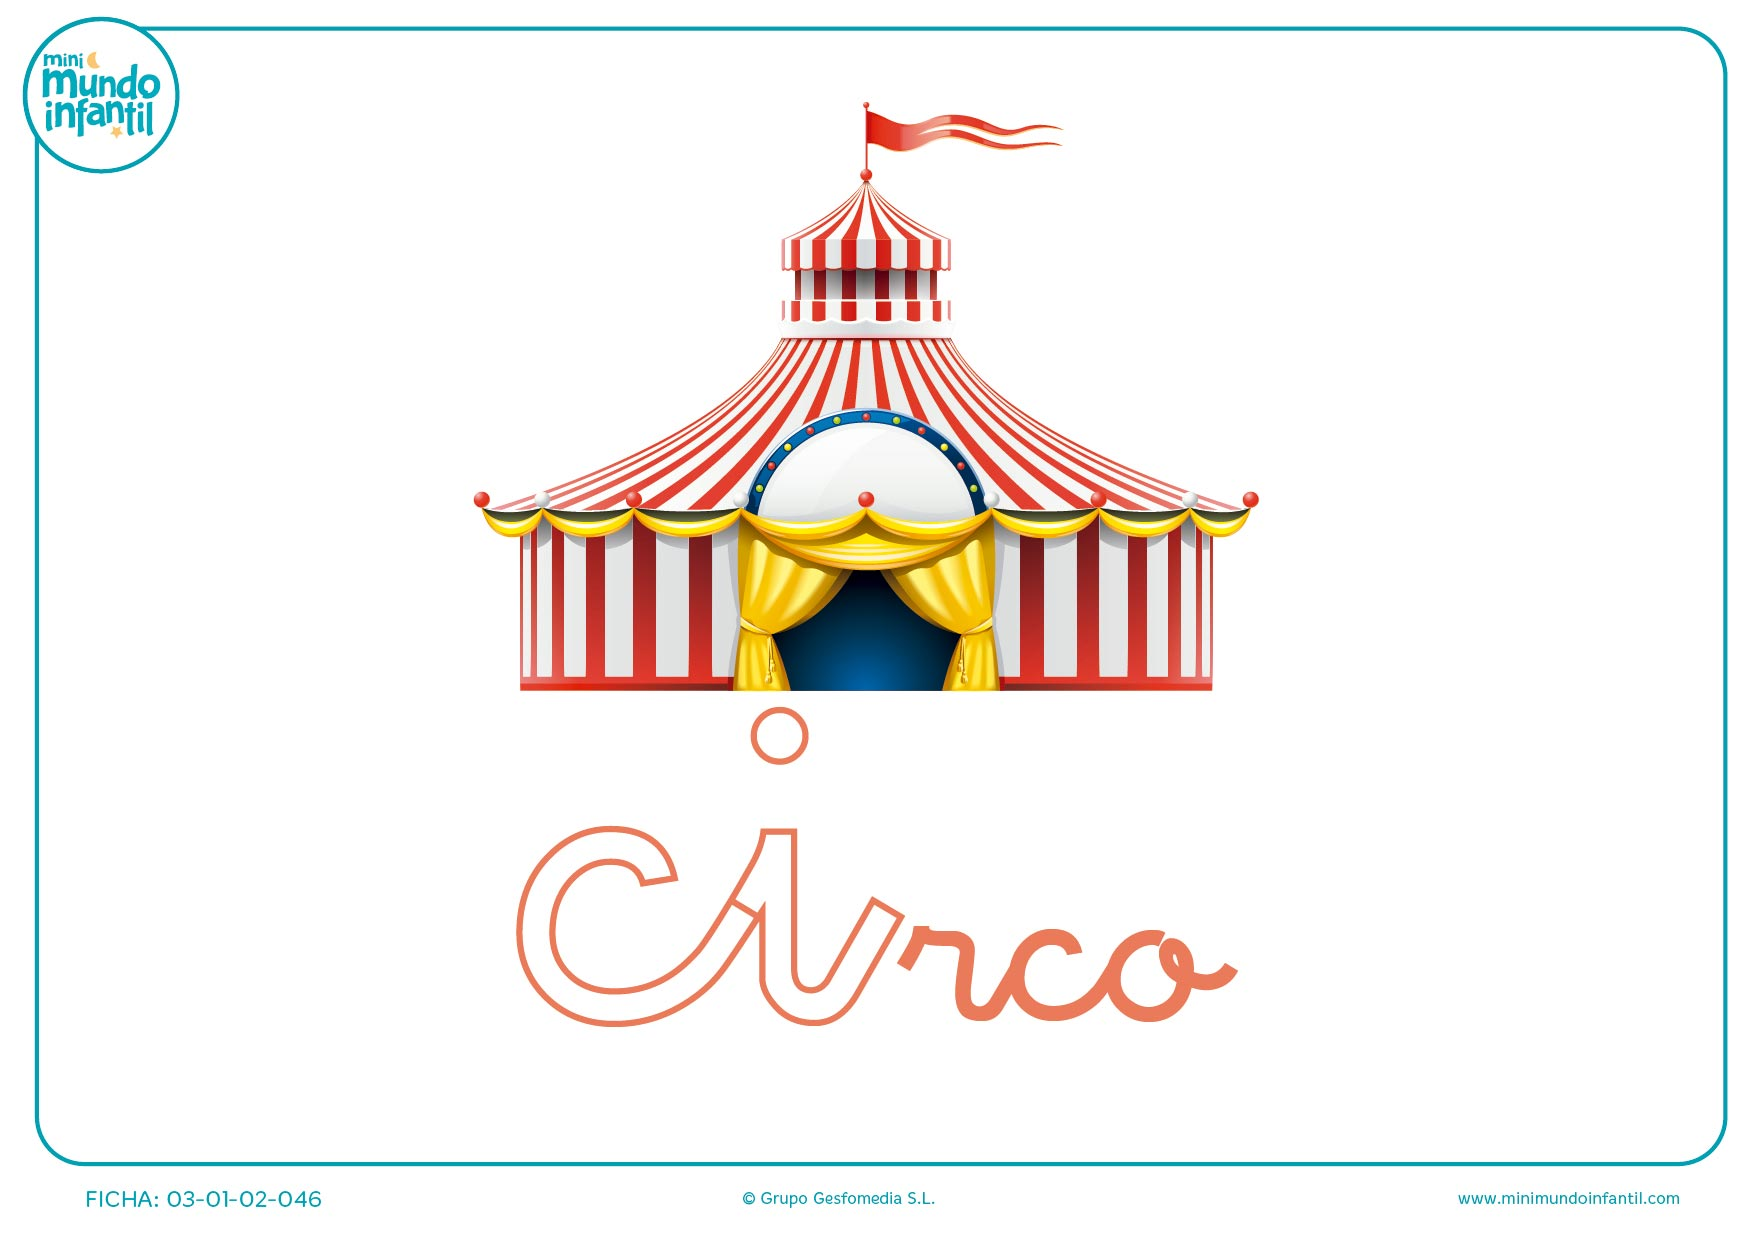 Pintar sílaba CI minúscula de circo